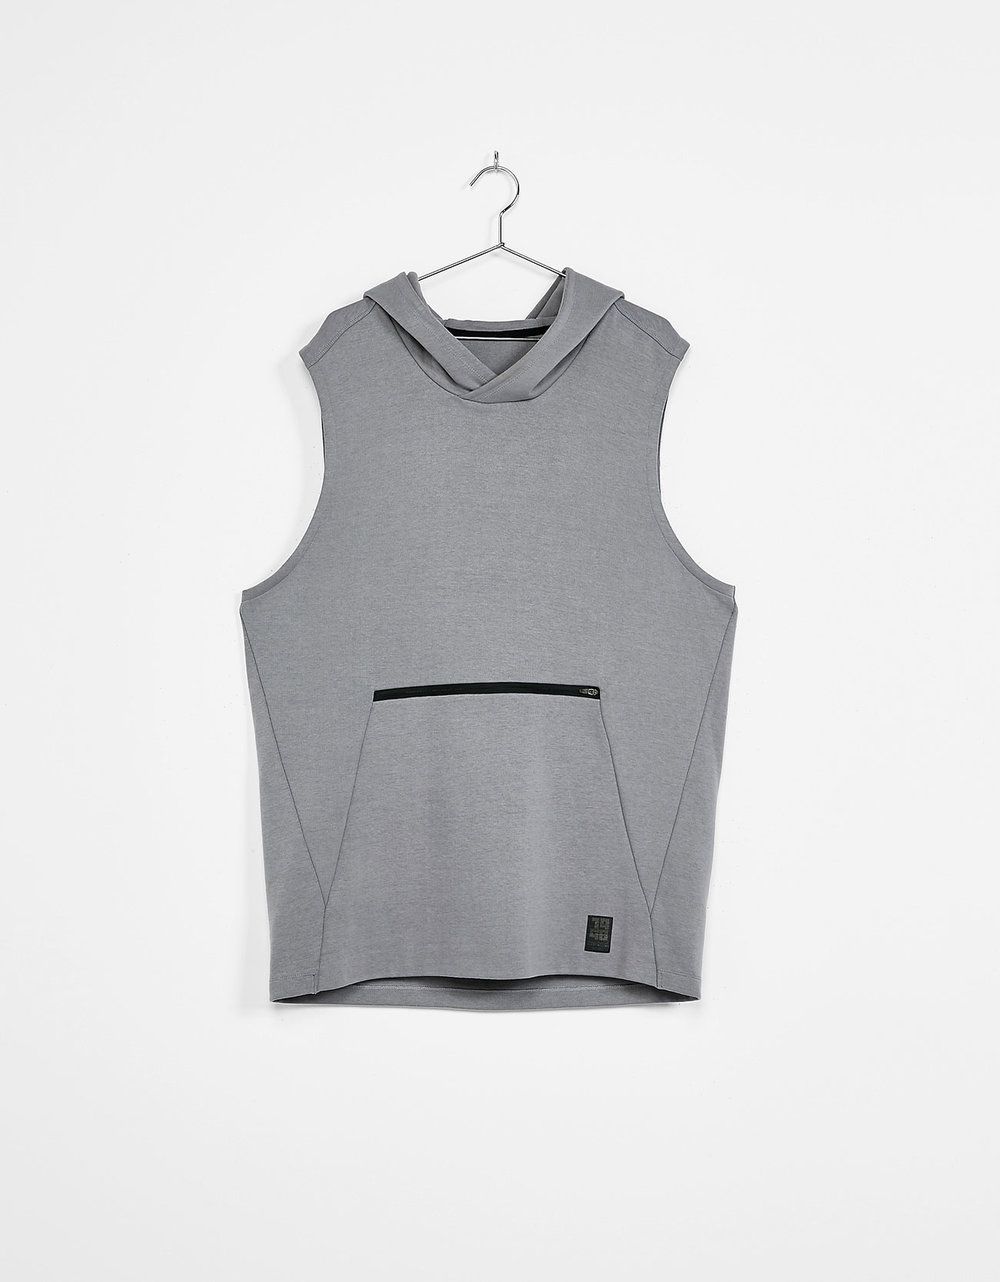 Hooded plush sport waistcoat , £22.99